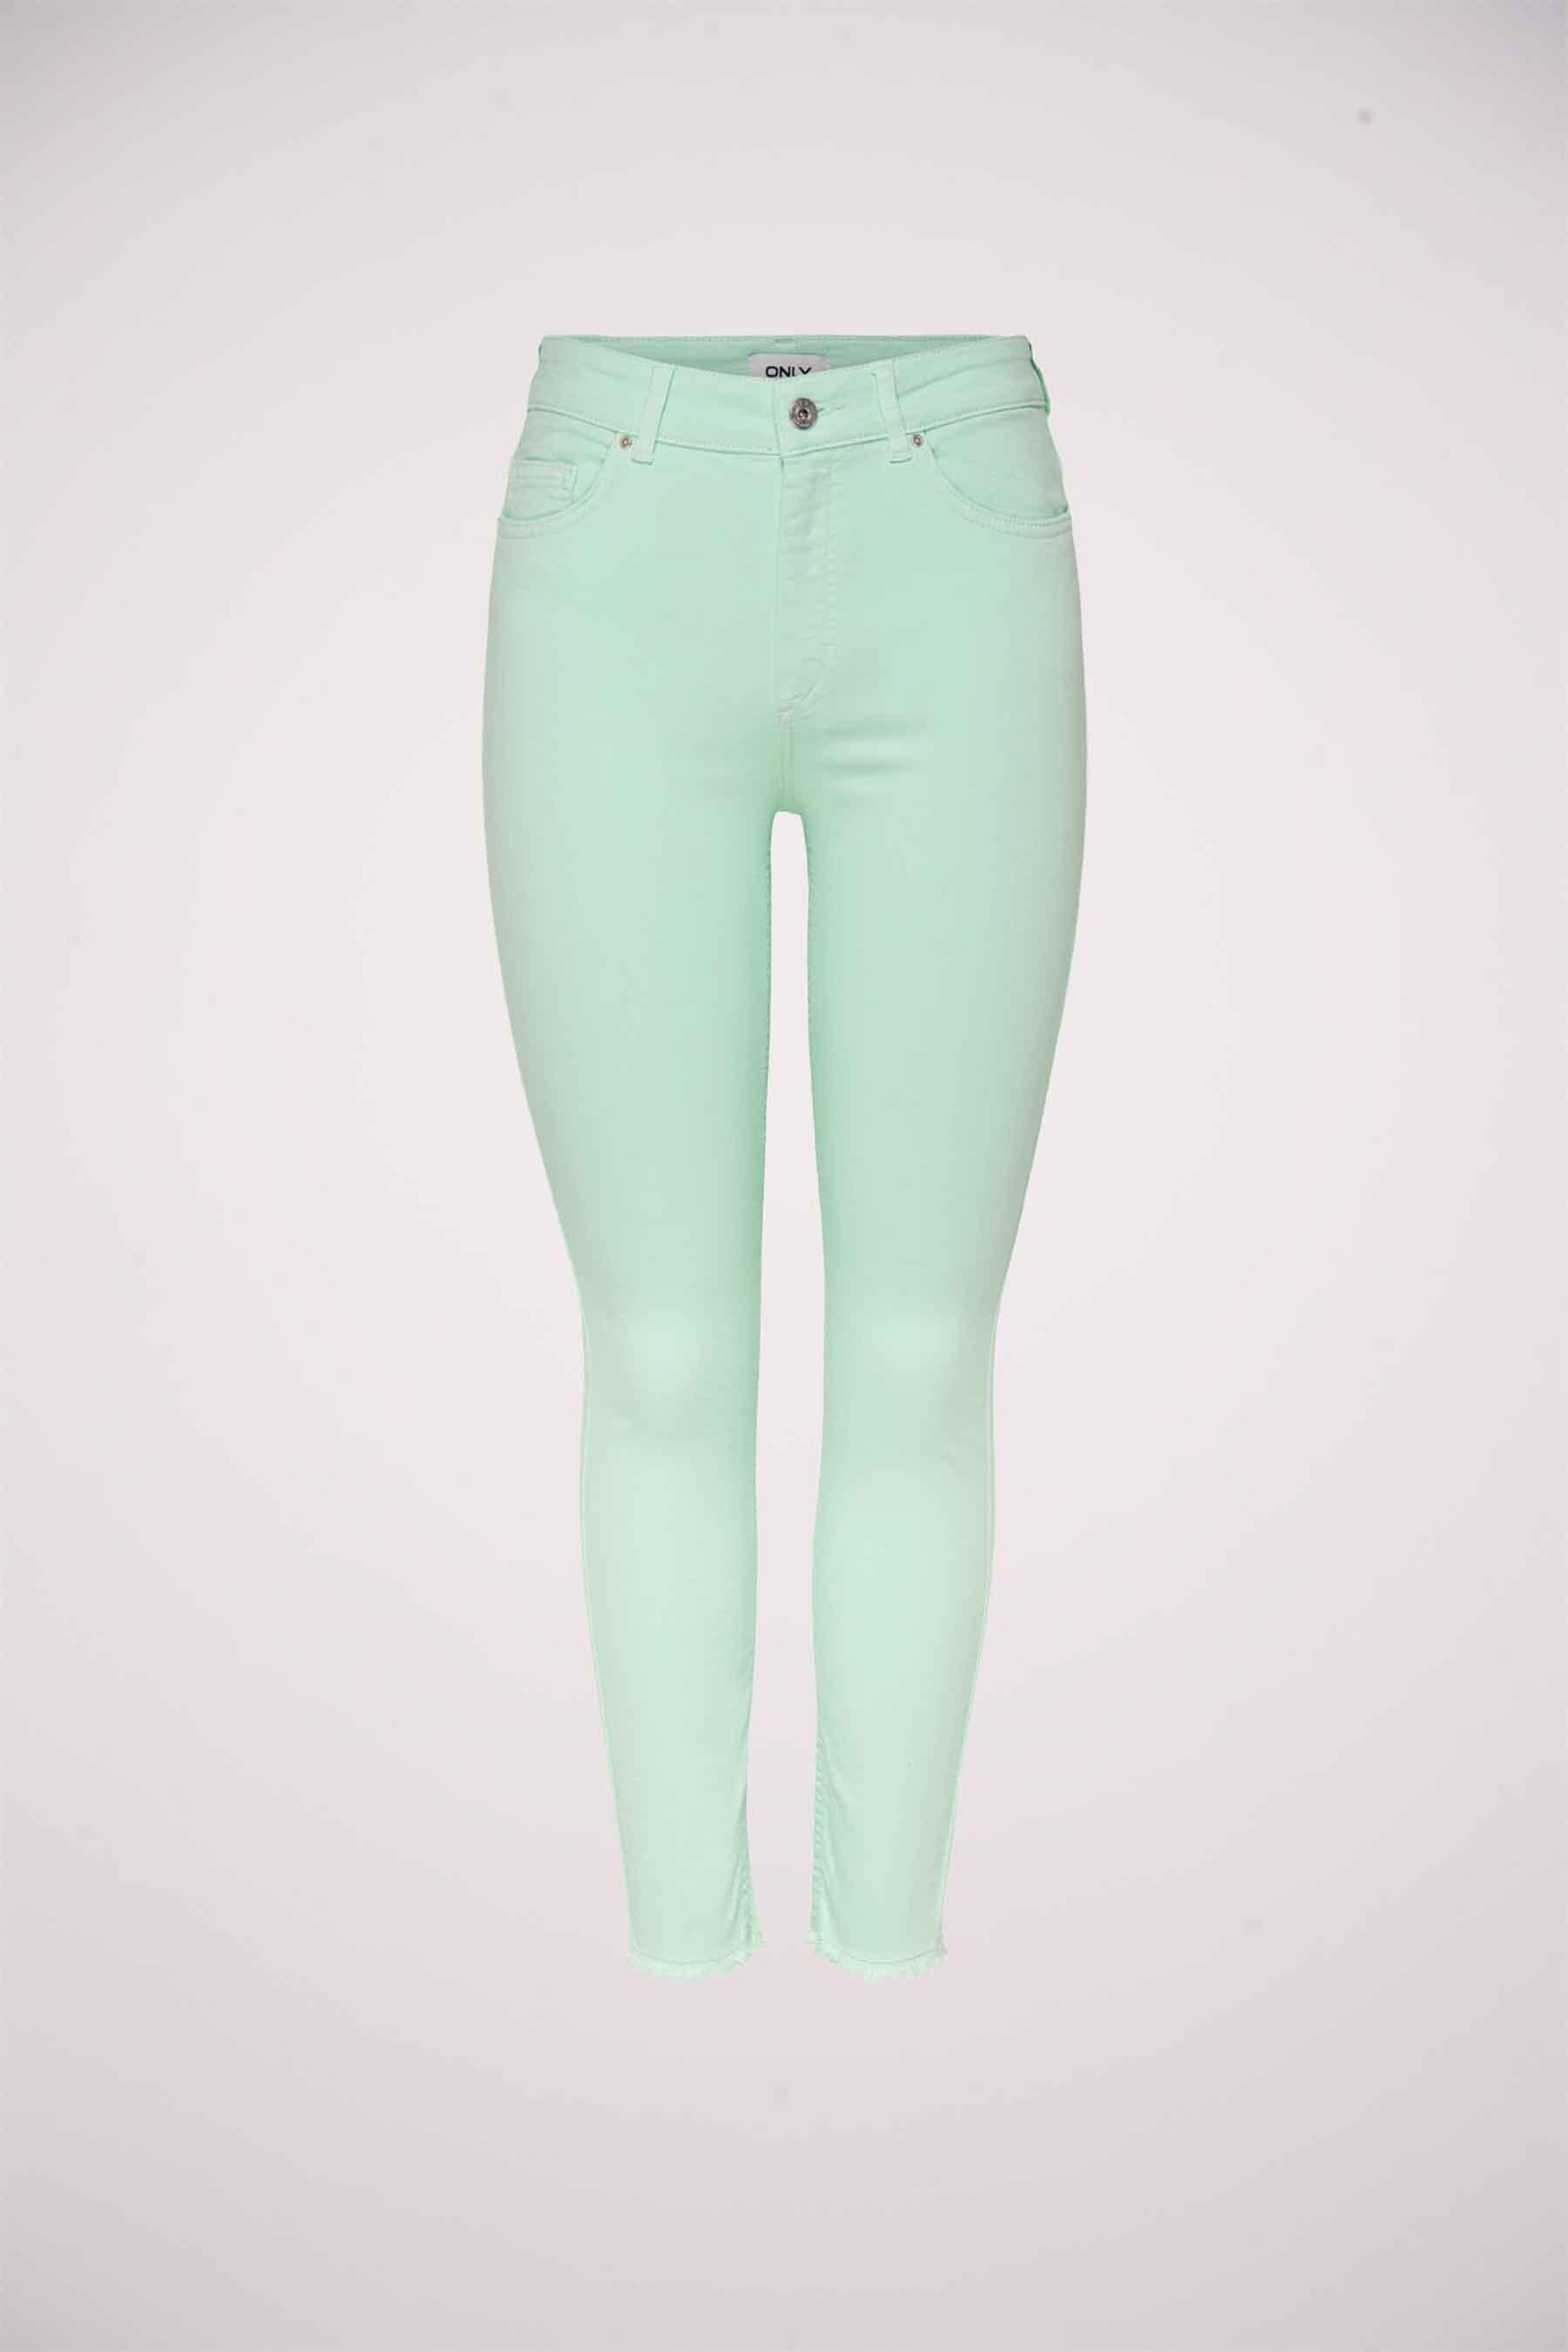 ONLY® Colorbroek, Groen, Dames, Maat: Sx32/XSx32